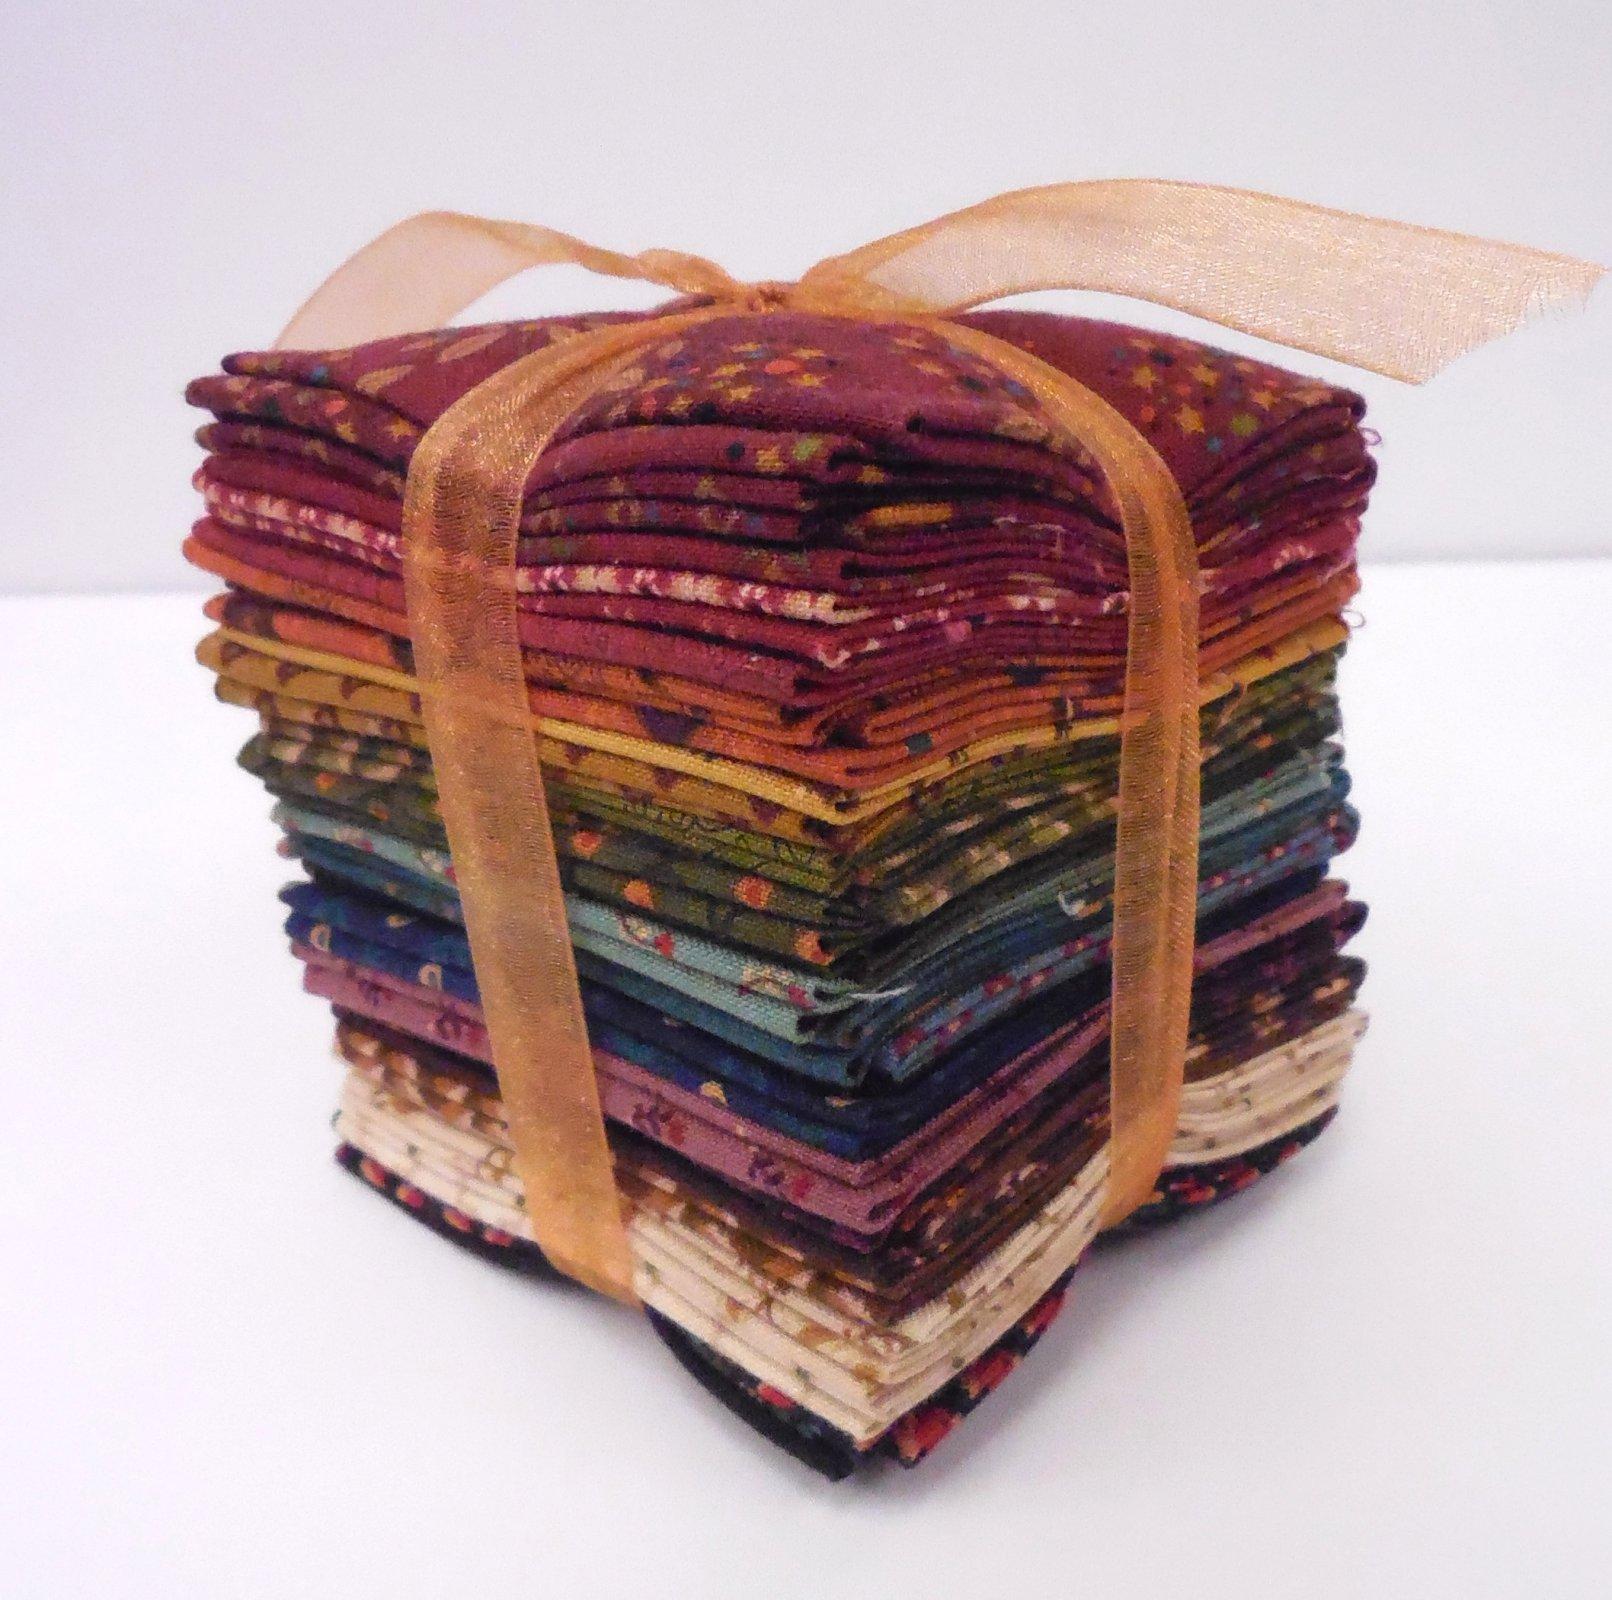 Sunday Best by Kim Diehl - Chubby 16 Bundle - 28 Pieces